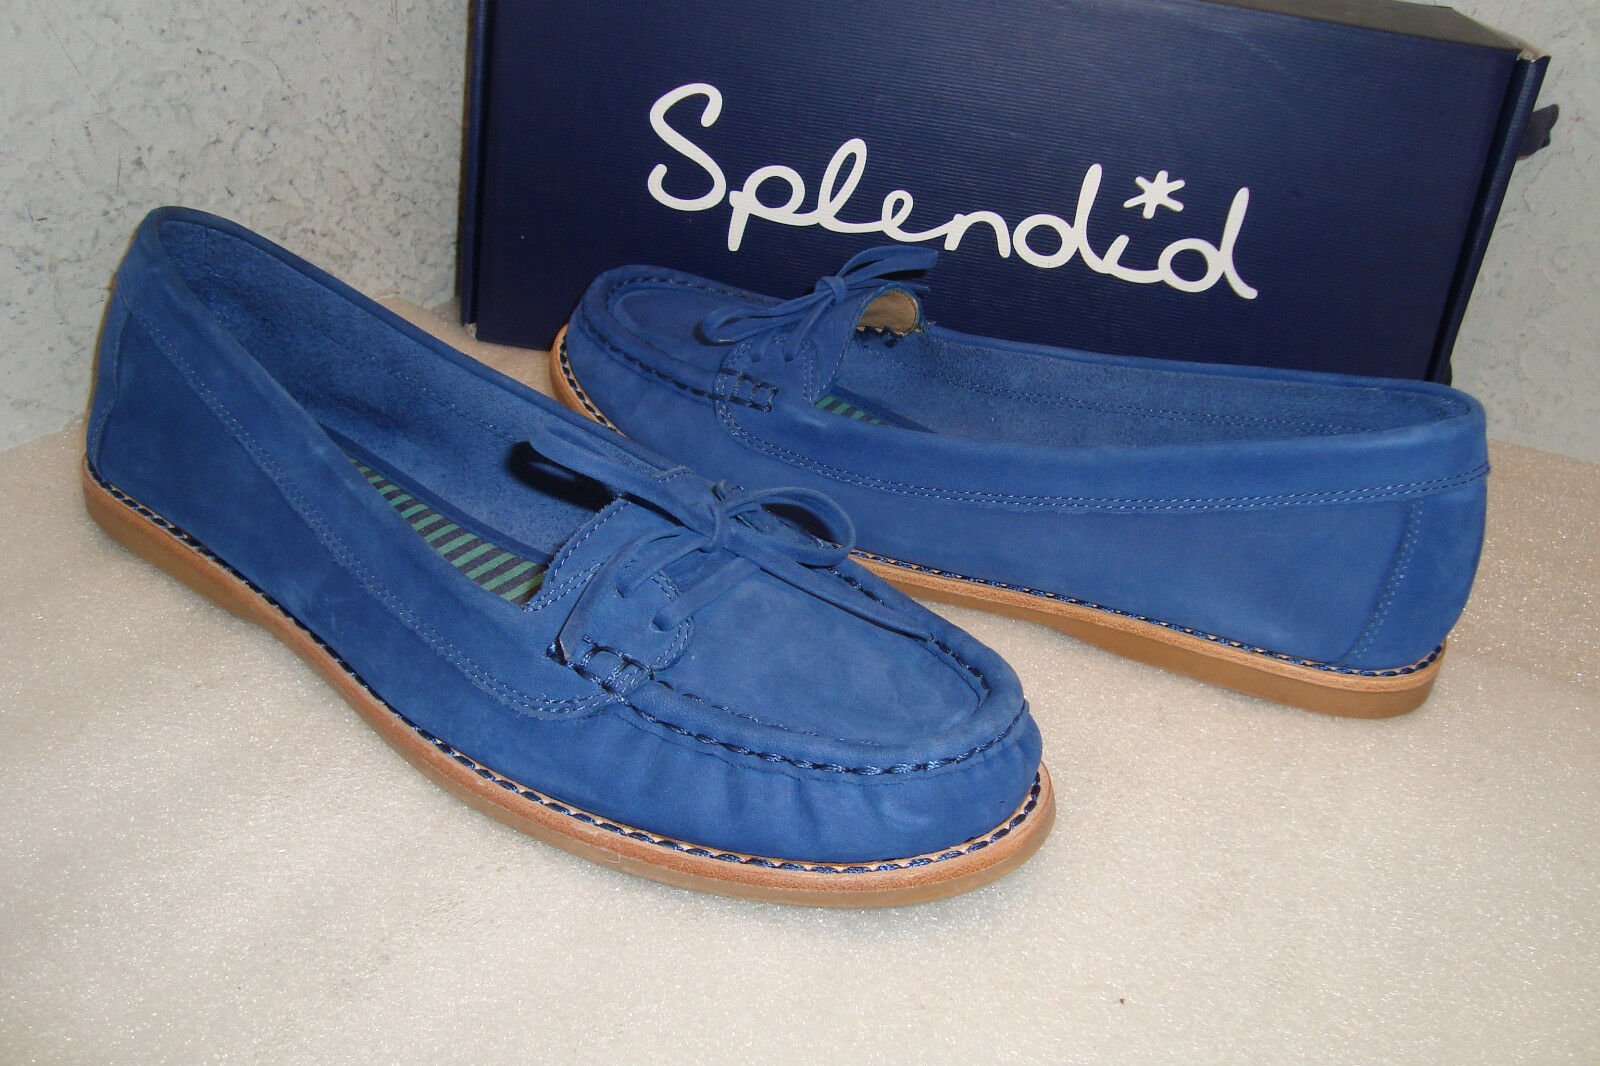 Splendid Footwear Damenschuhe NWB Breakwater Blau Casual Flats Schuhes 8 M NEU Leder